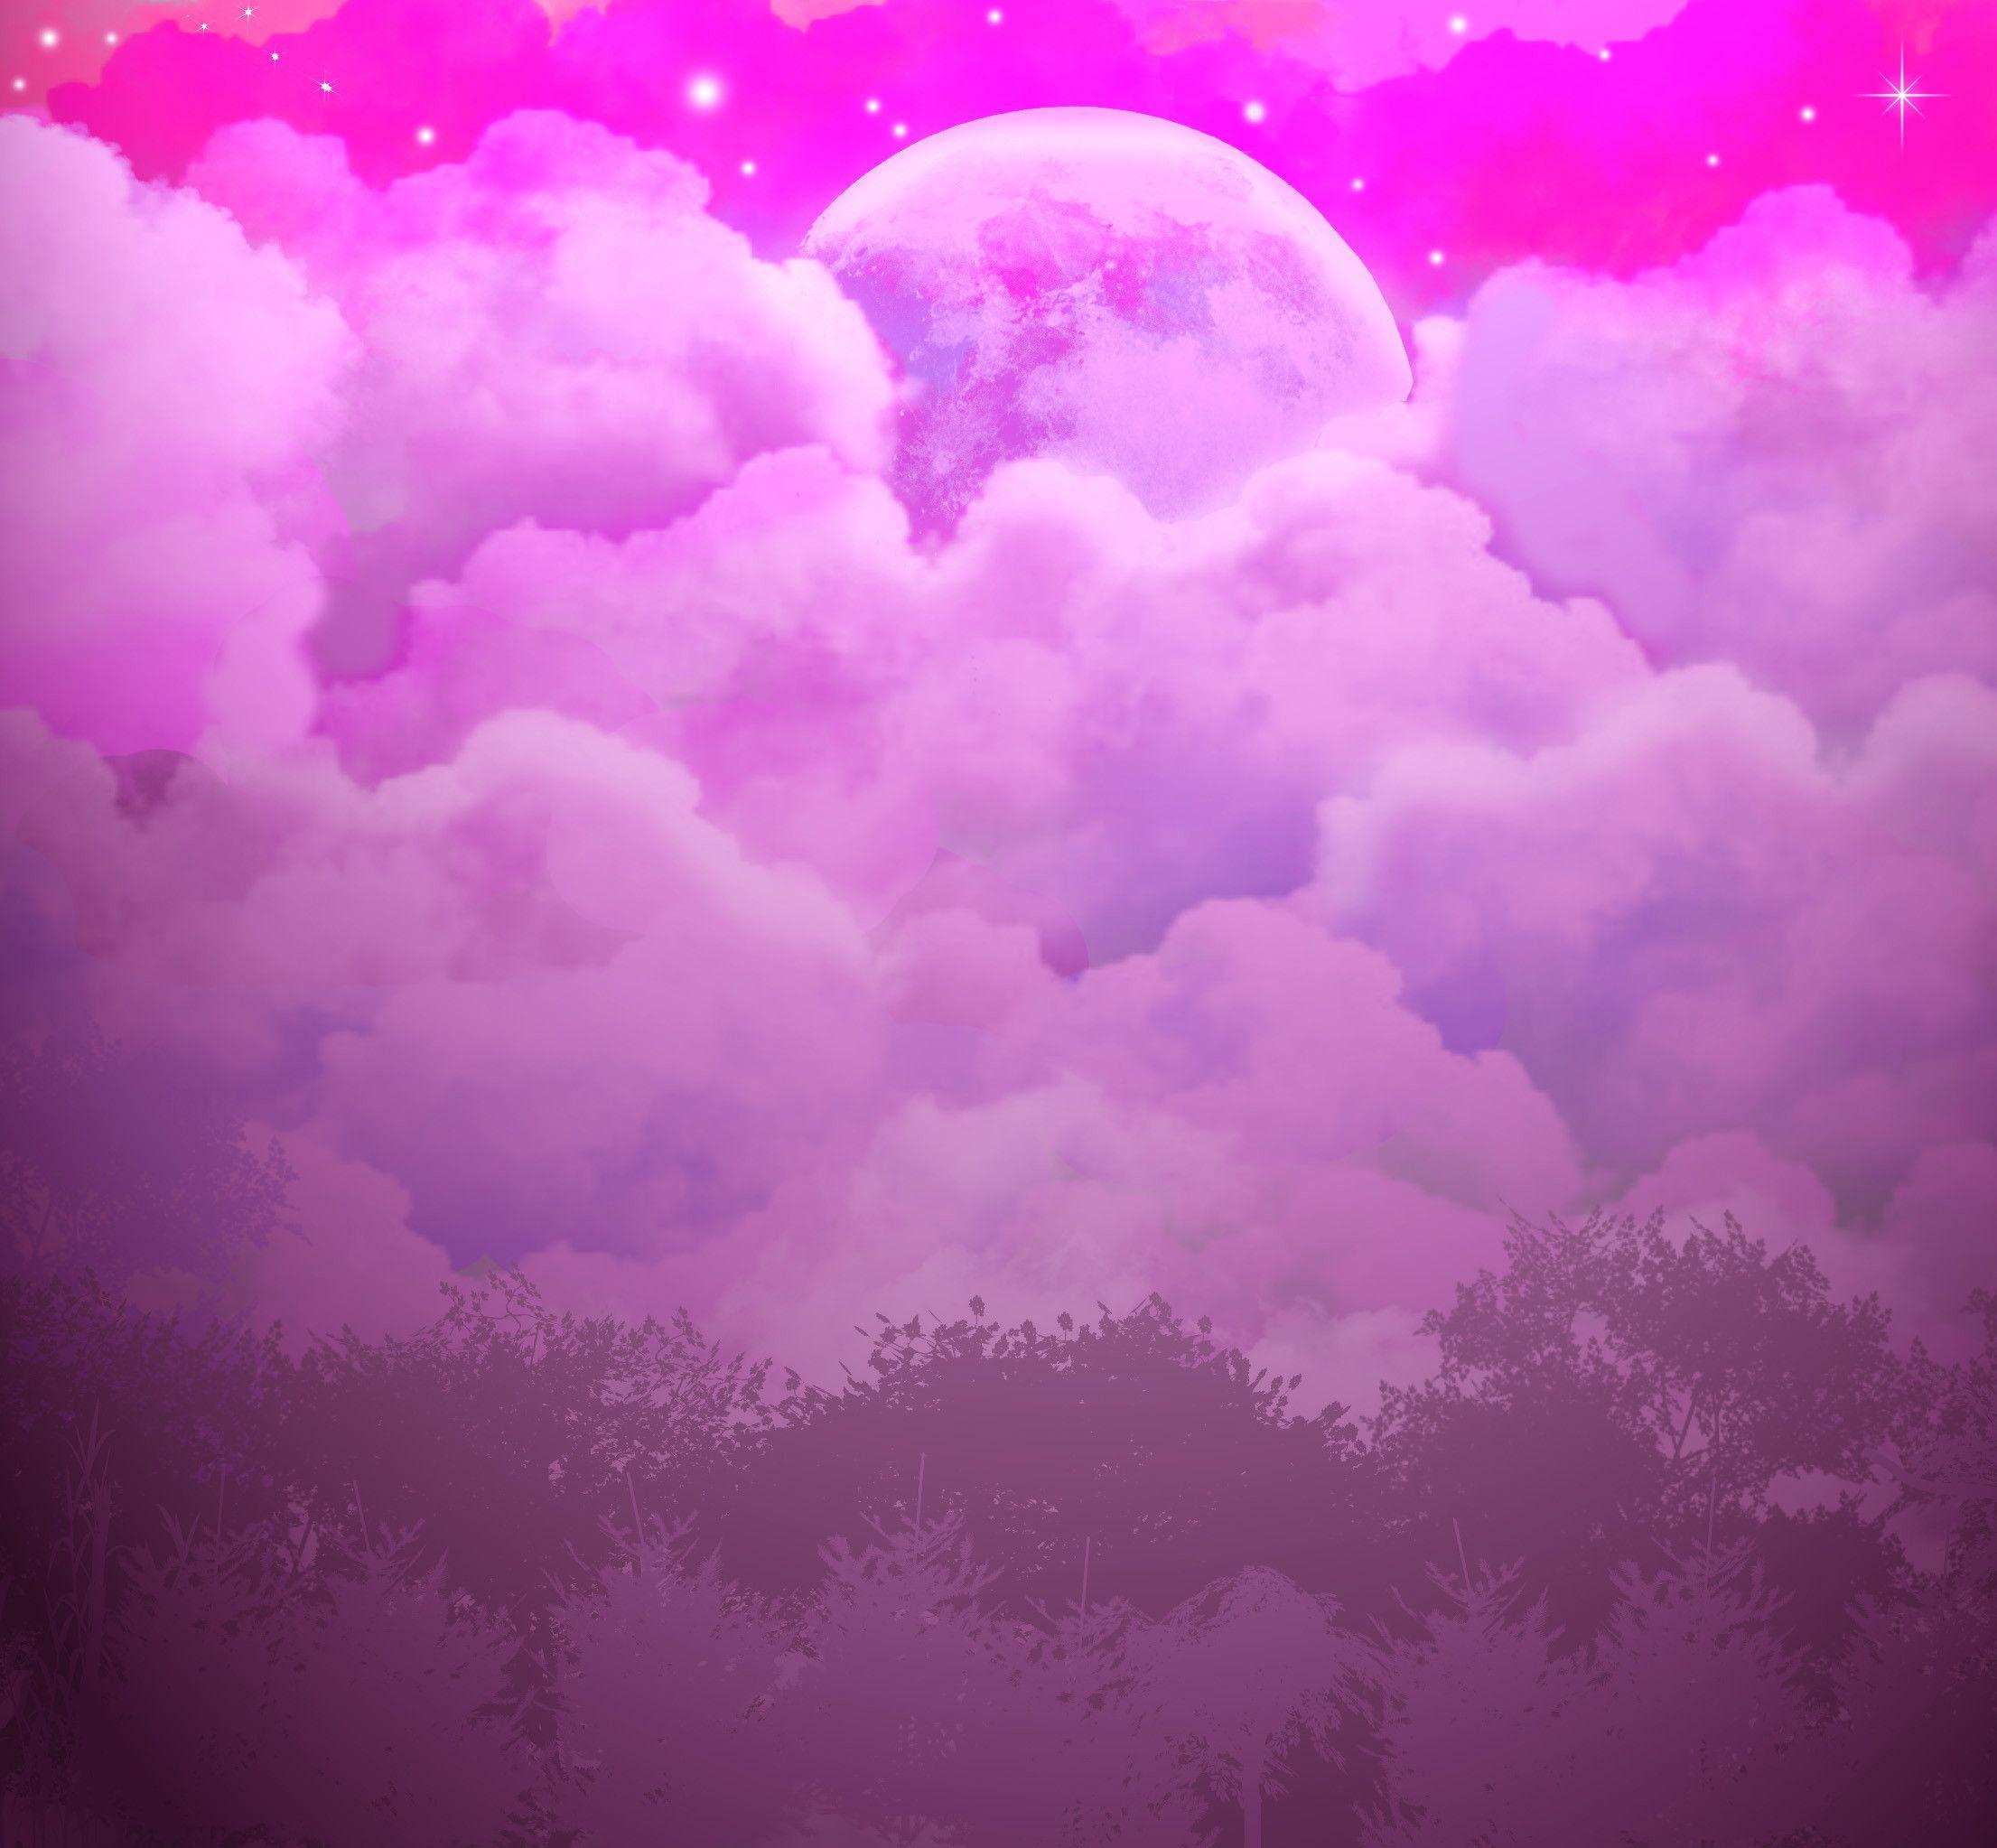 Фон аниме для фотошопа